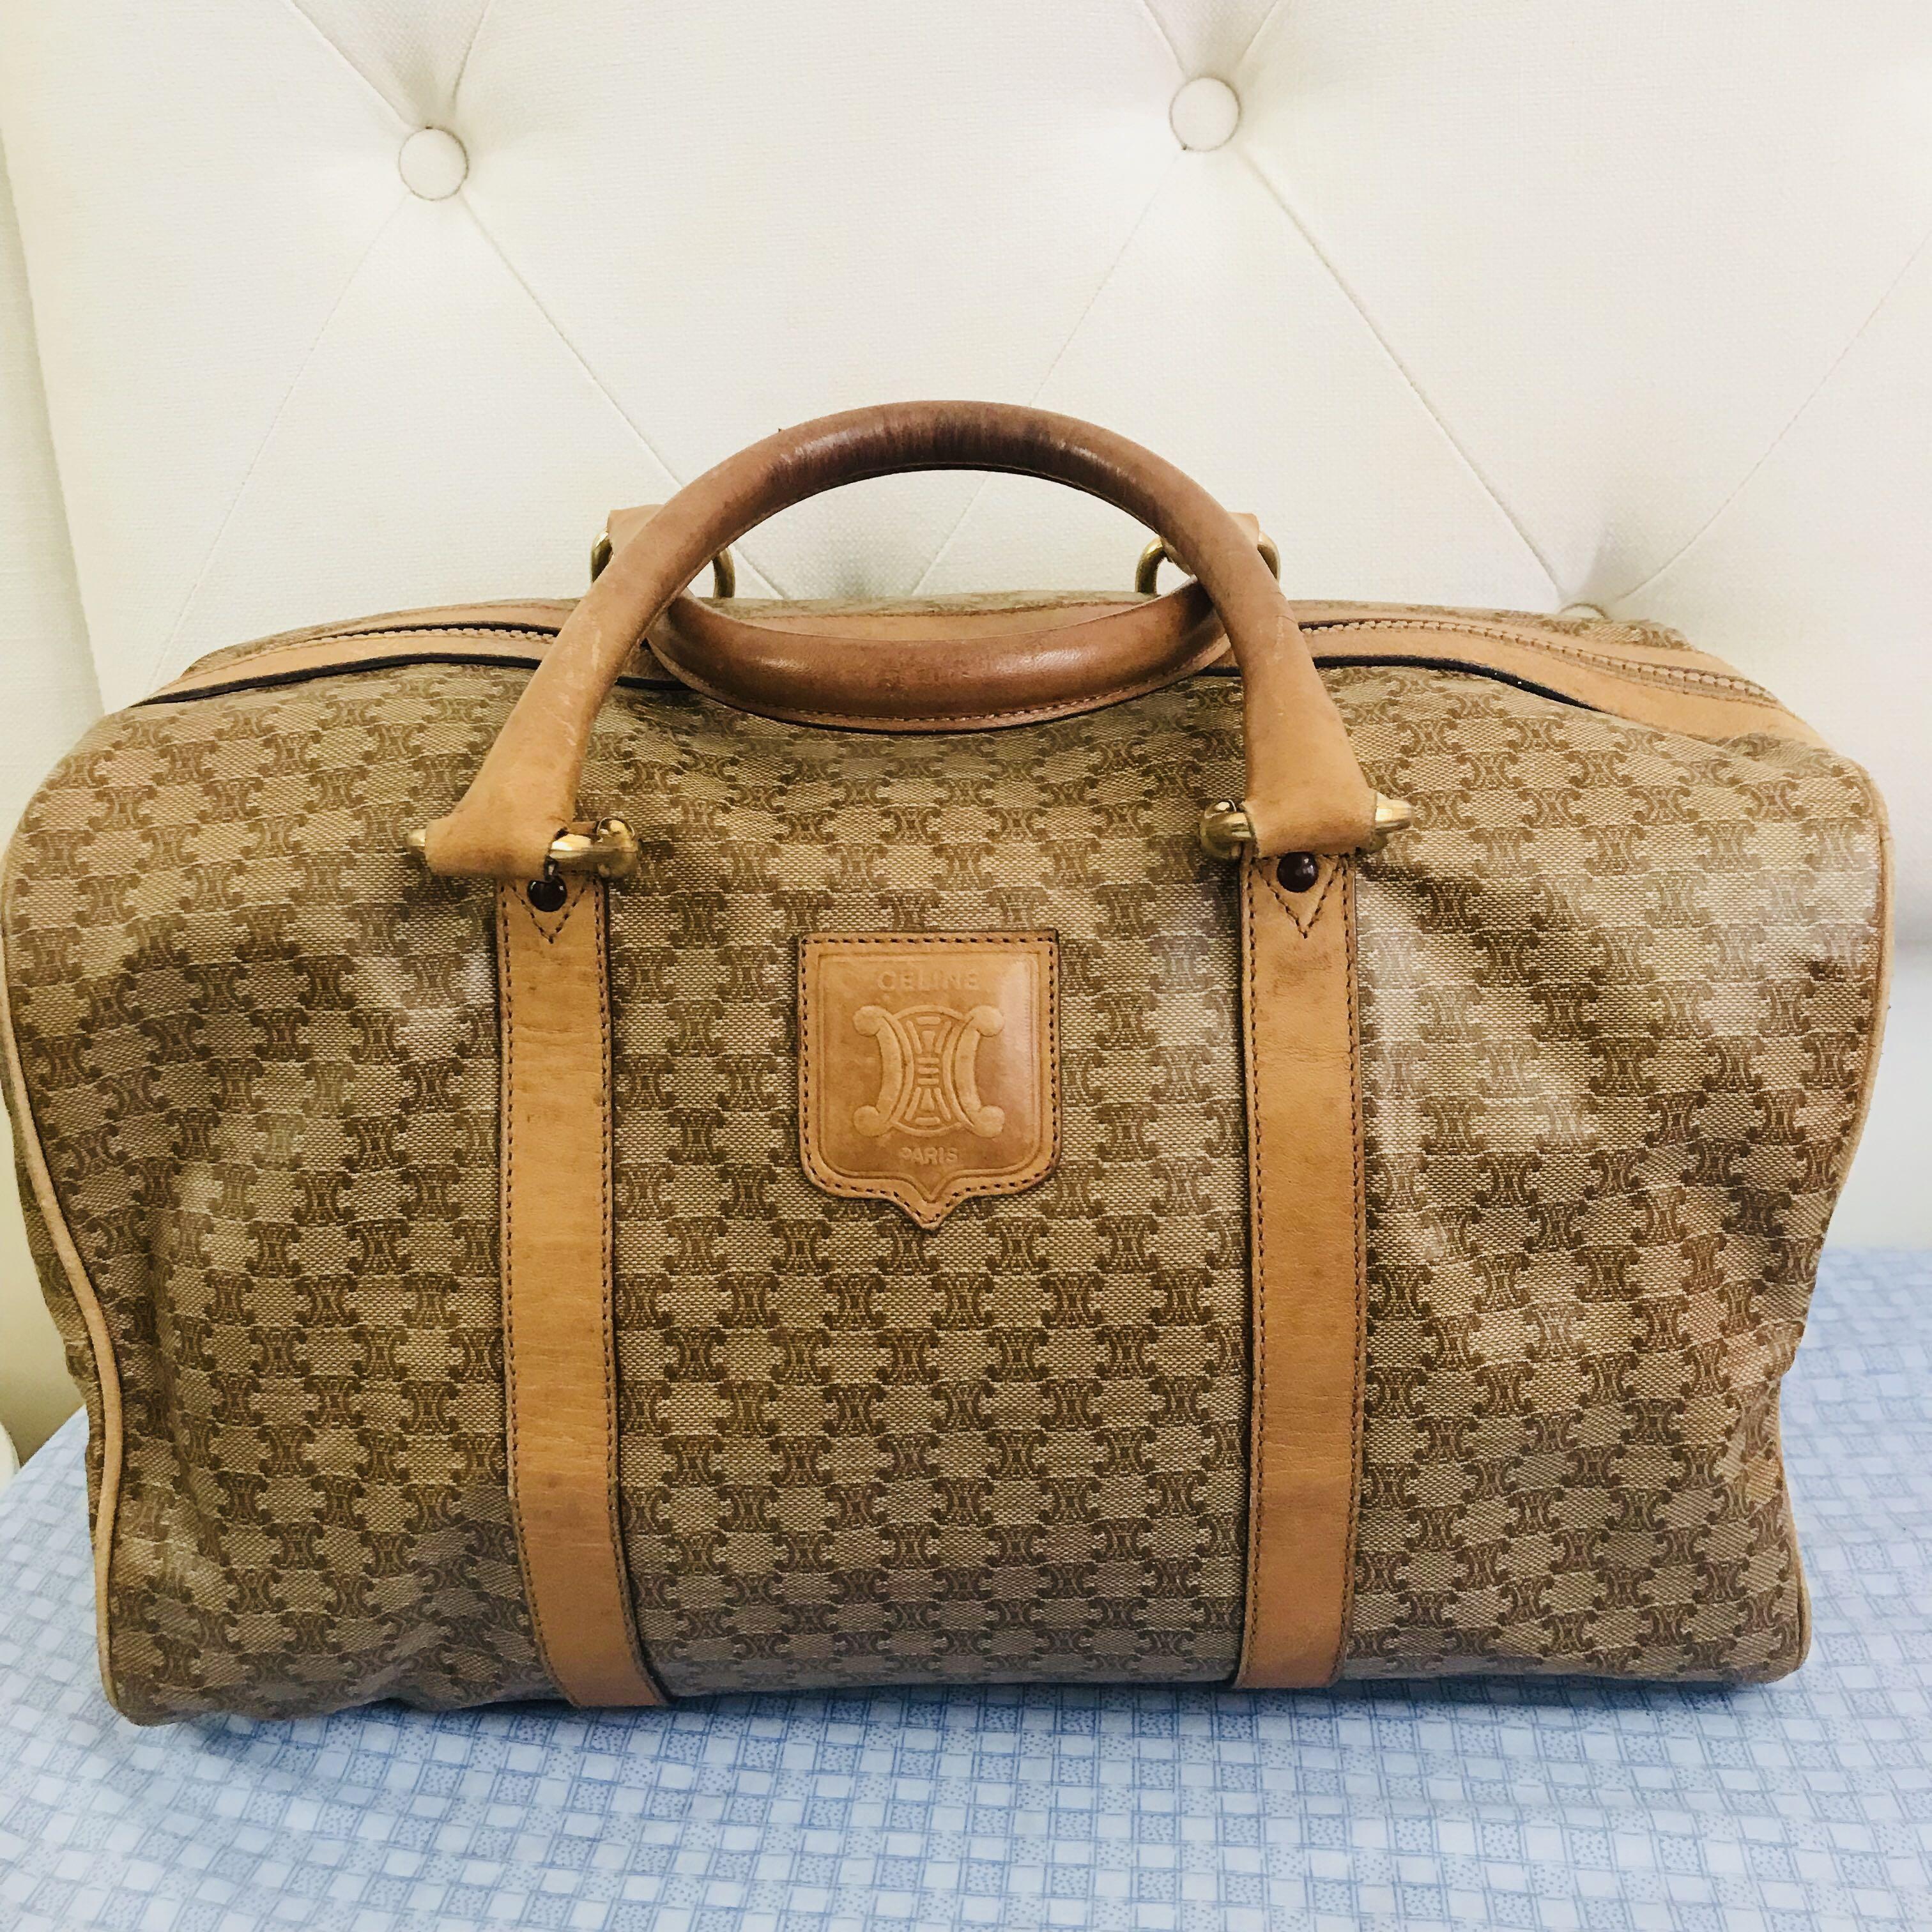 Celine Bowling Bag   Weekender Bag, Women s Fashion, Bags   Wallets on  Carousell 3c5e58d6e2